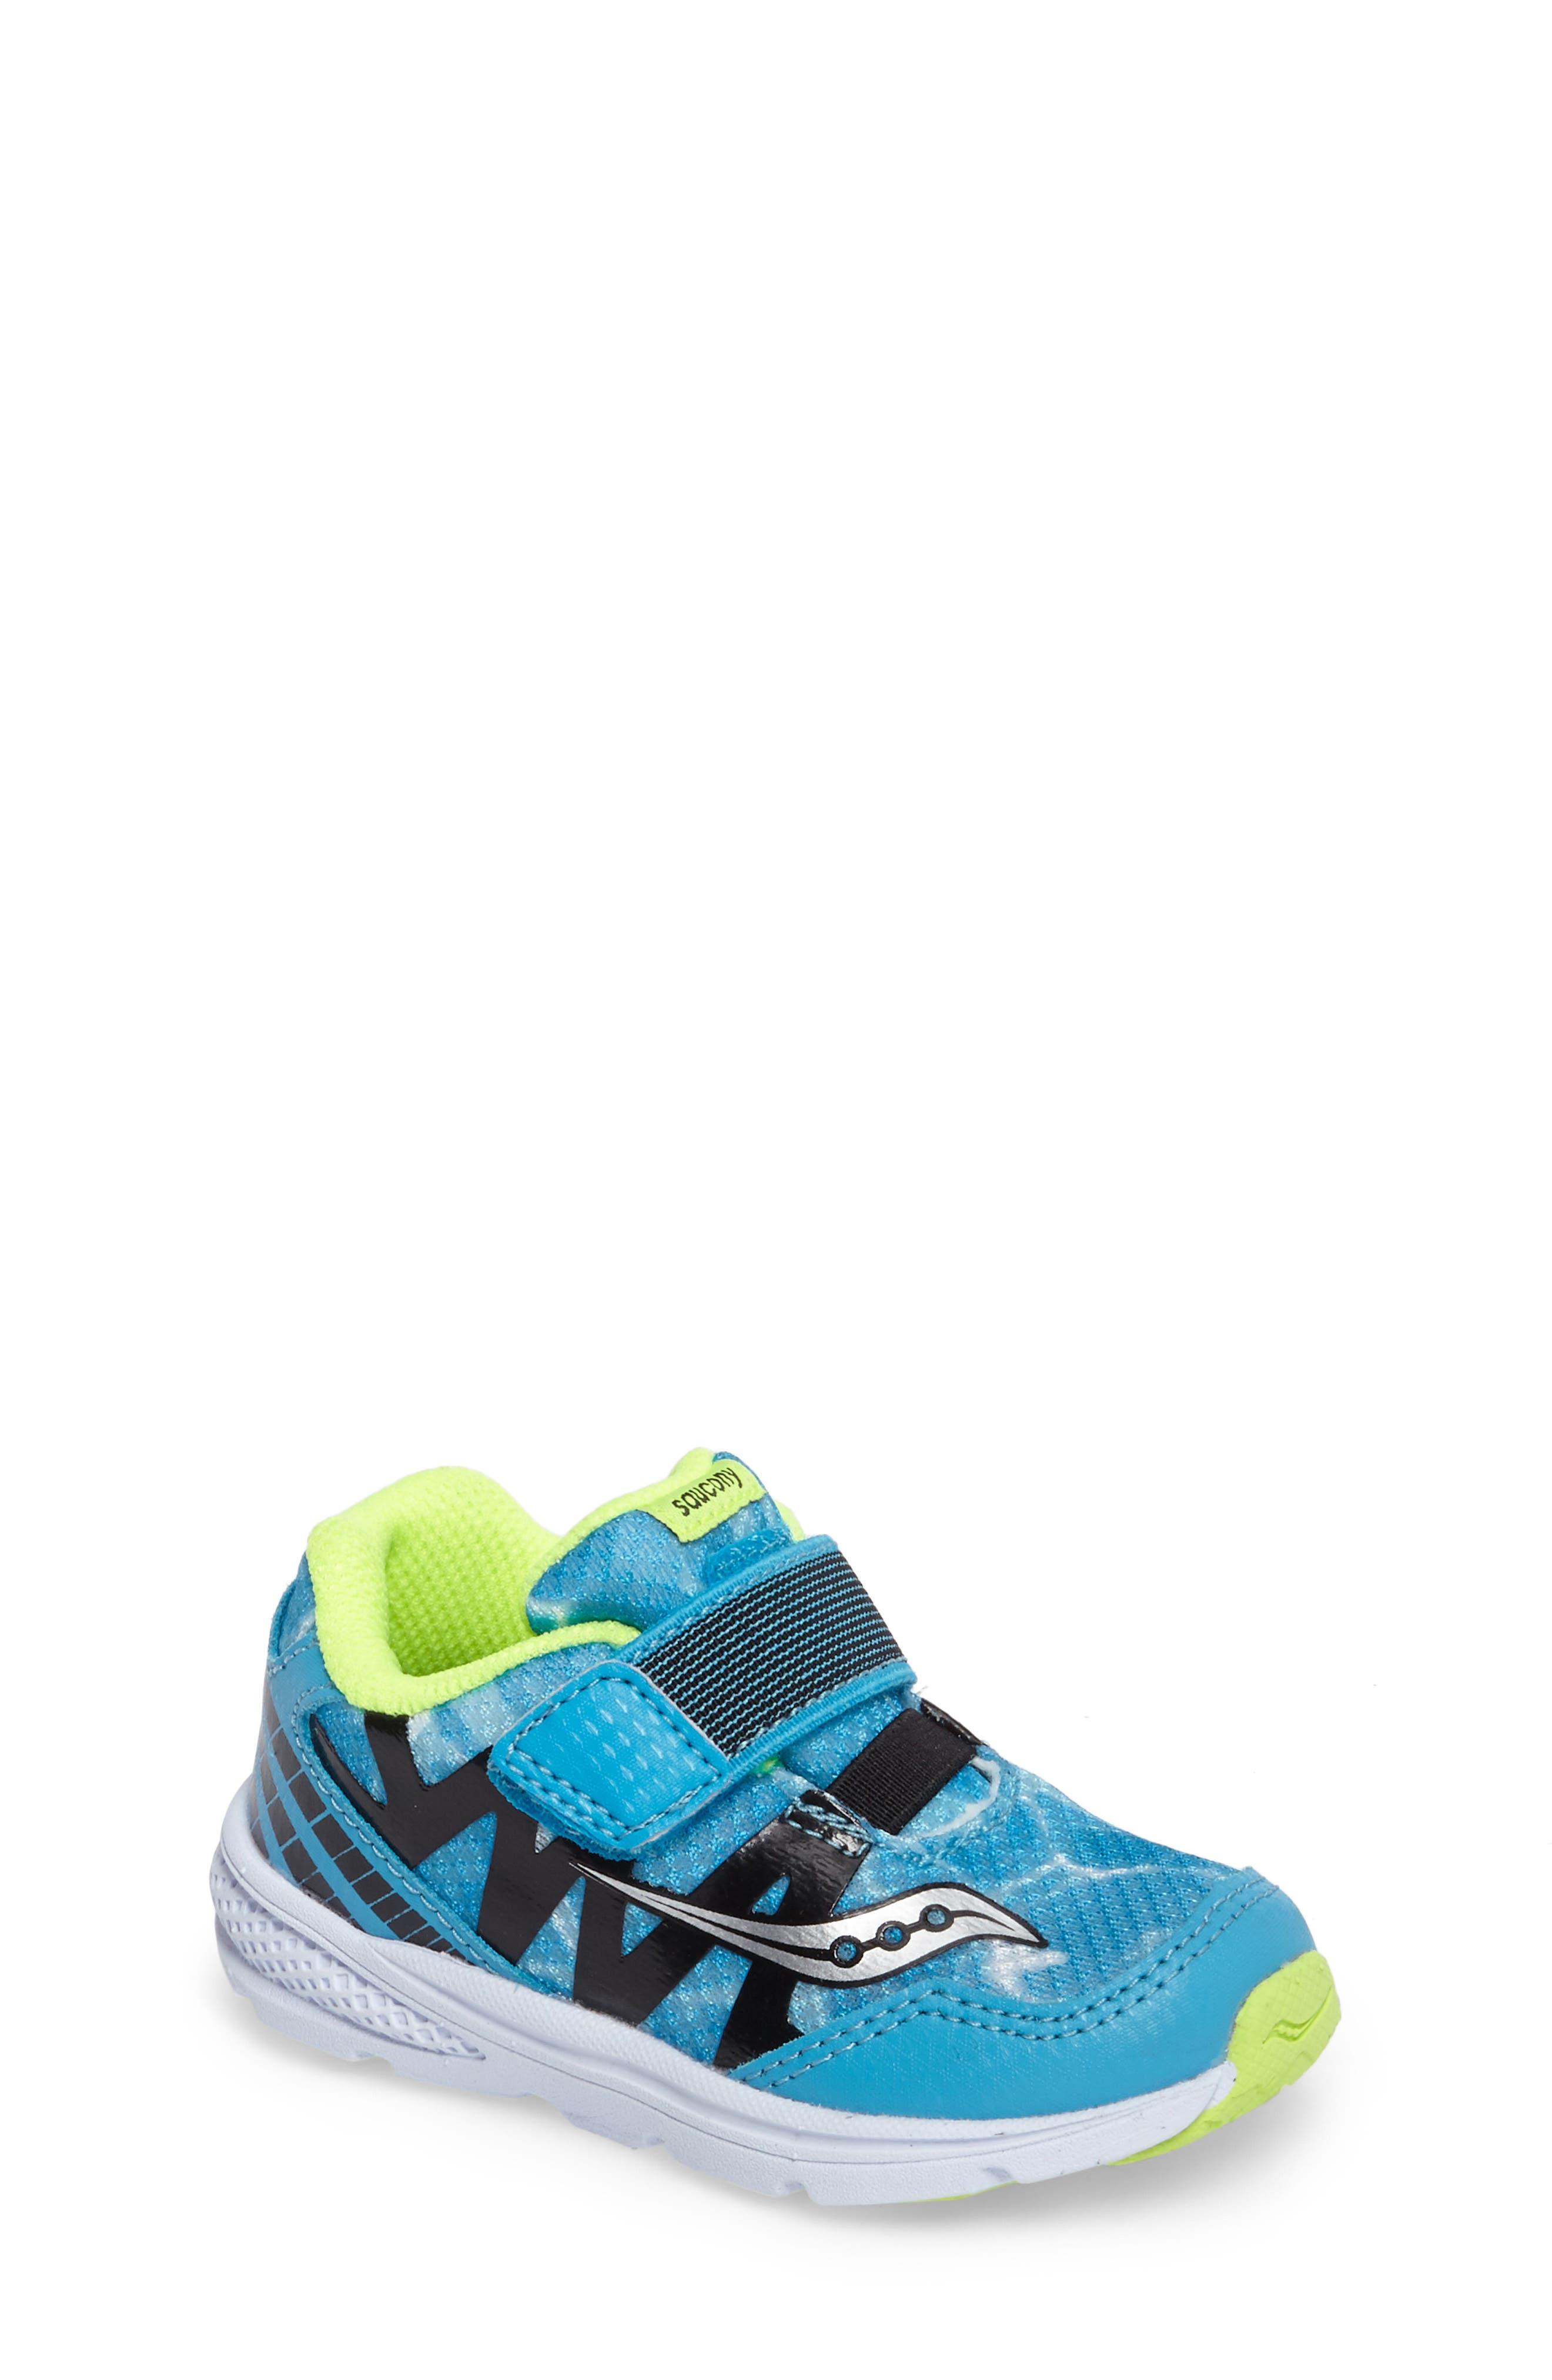 Baby Ride Pro Sneaker,                         Main,                         color, 400